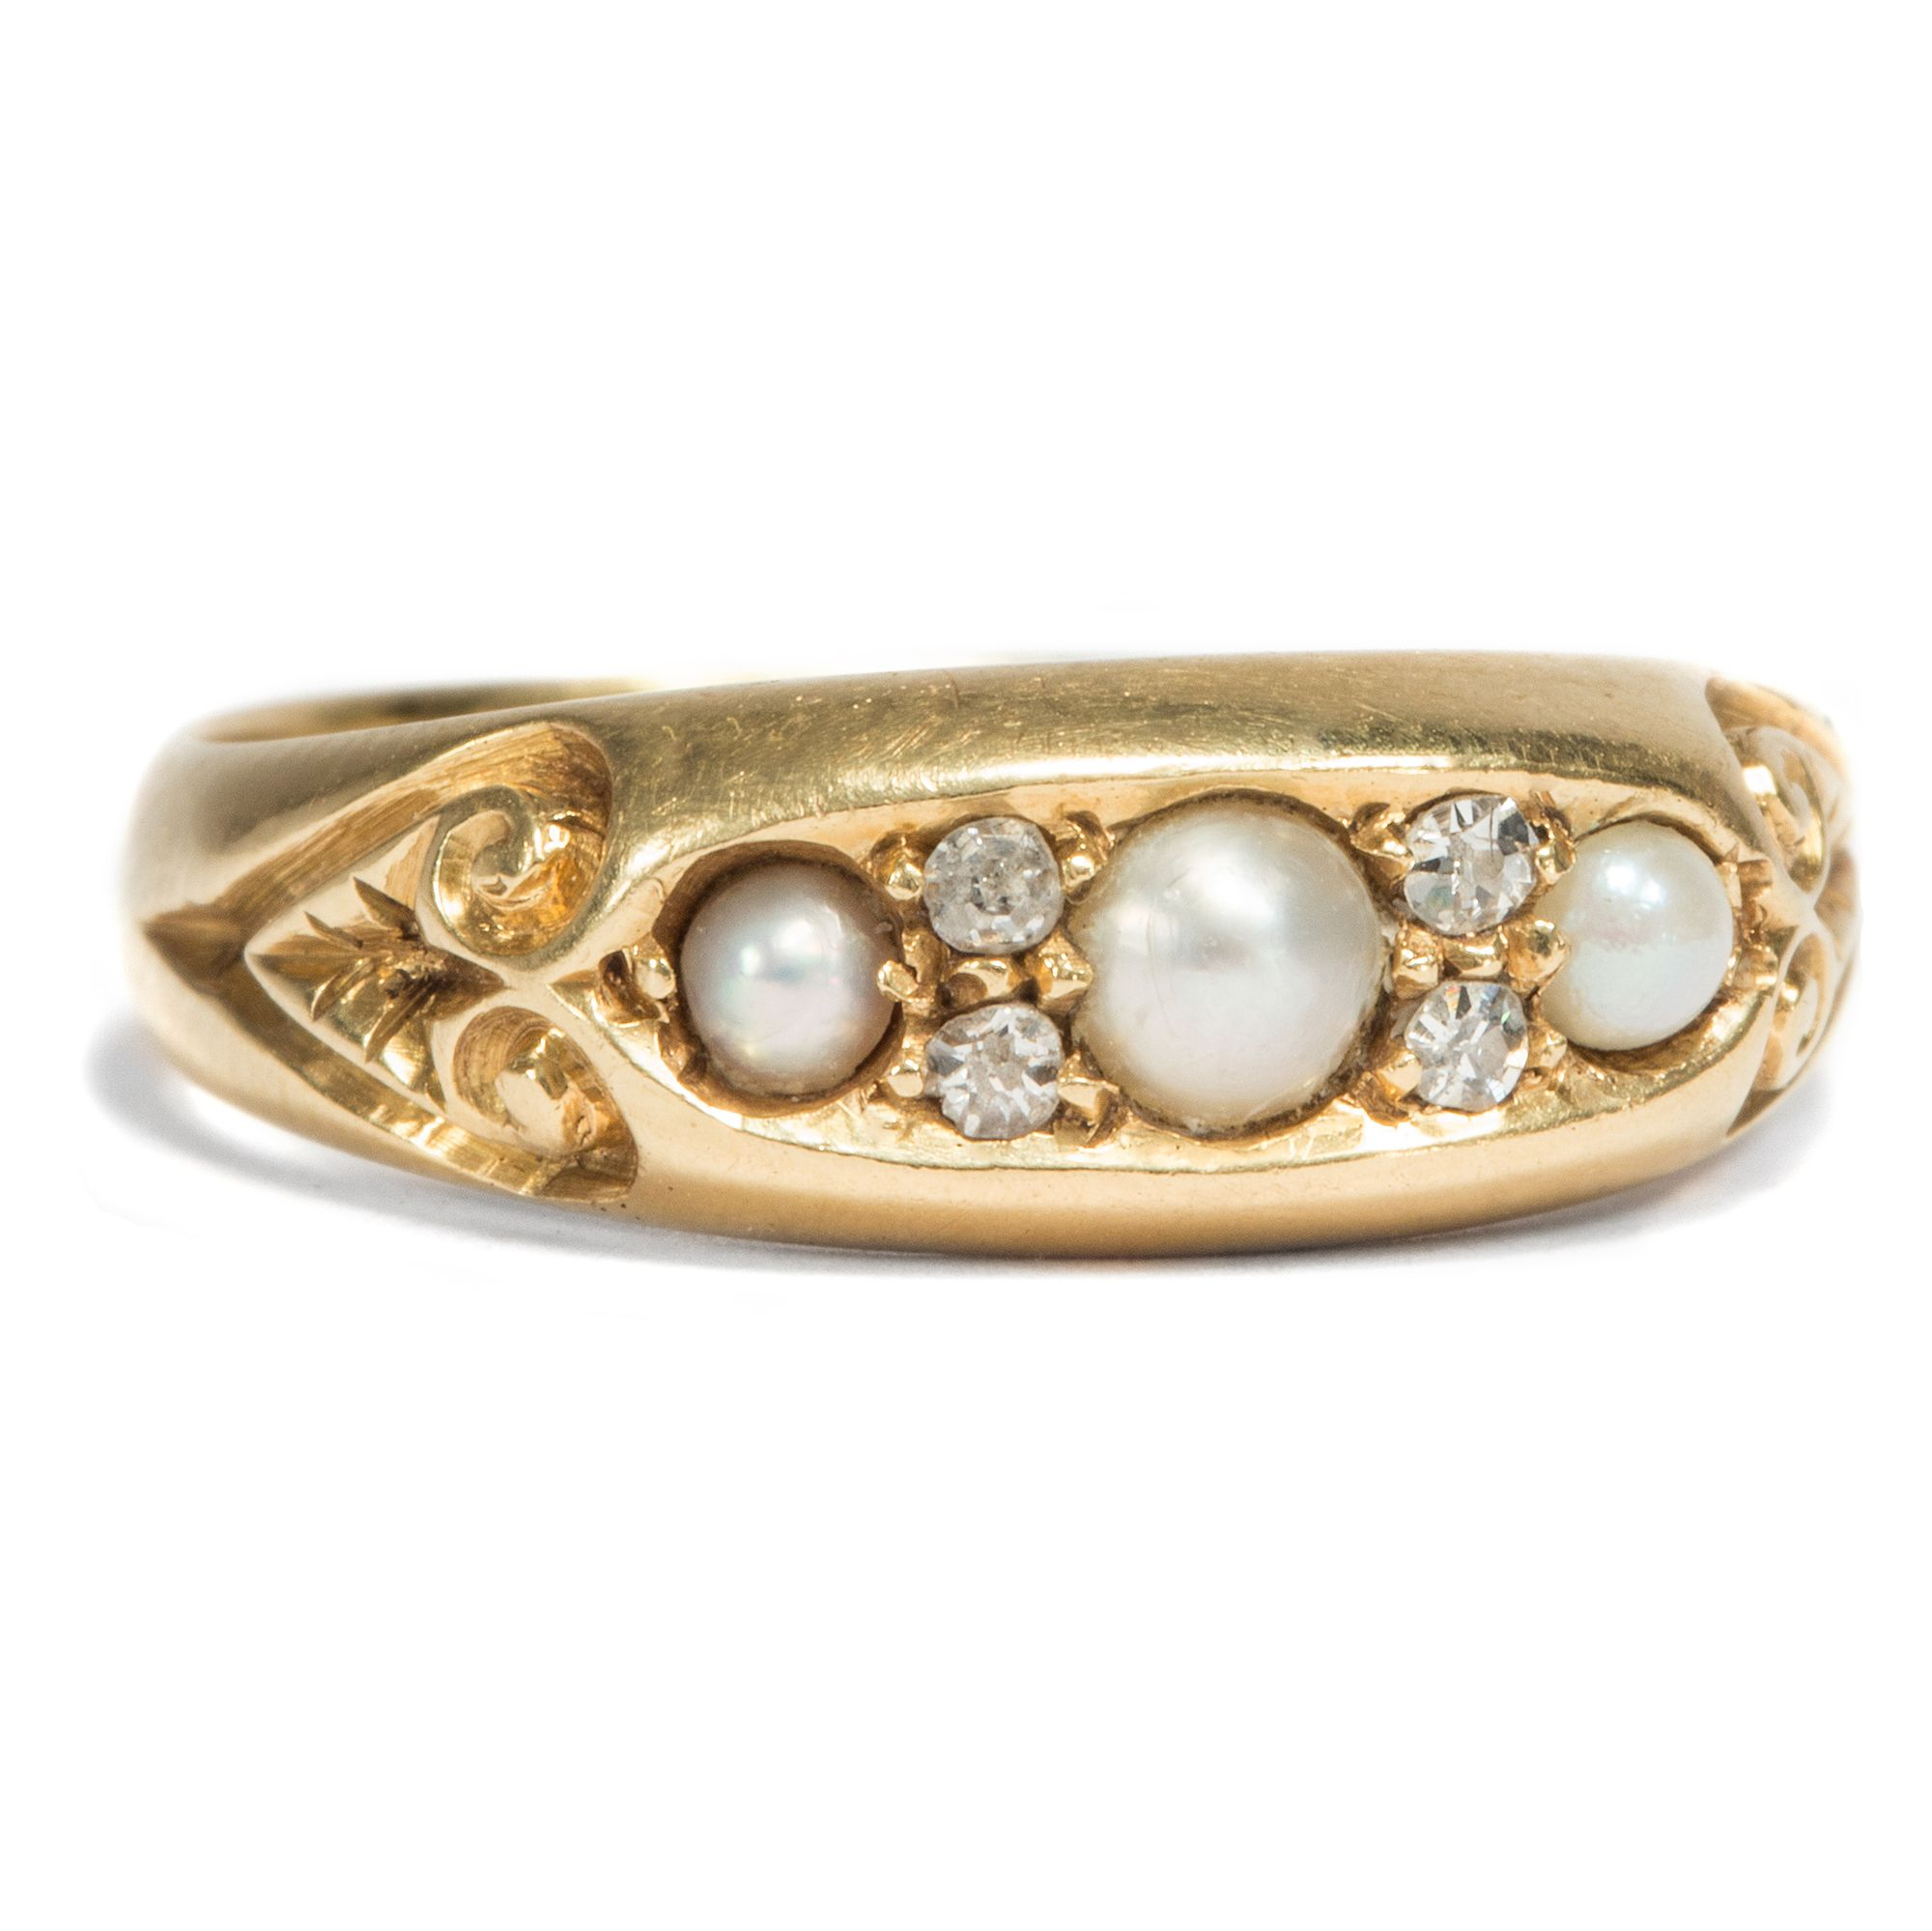 eternal love feiner goldring mit diamanten naturperlen chester 1901 von hofer antikschmuck. Black Bedroom Furniture Sets. Home Design Ideas